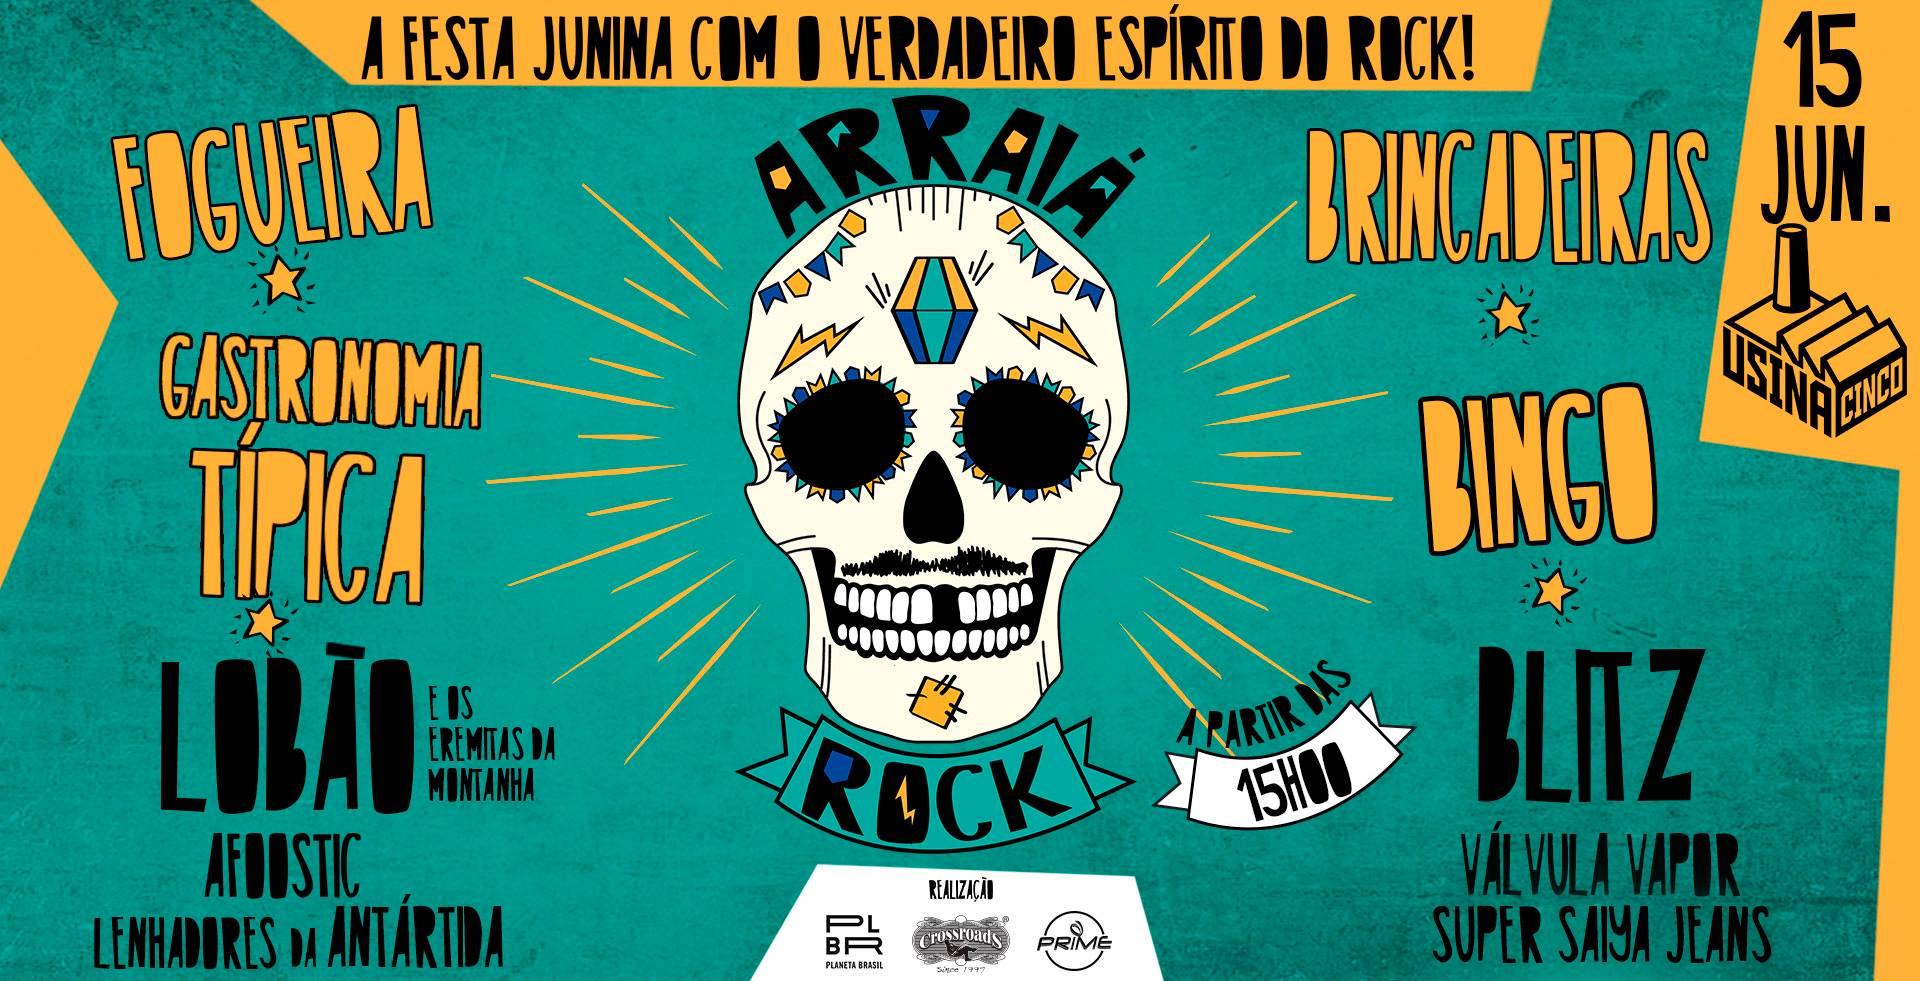 CANCELADO: Arraiá Rock